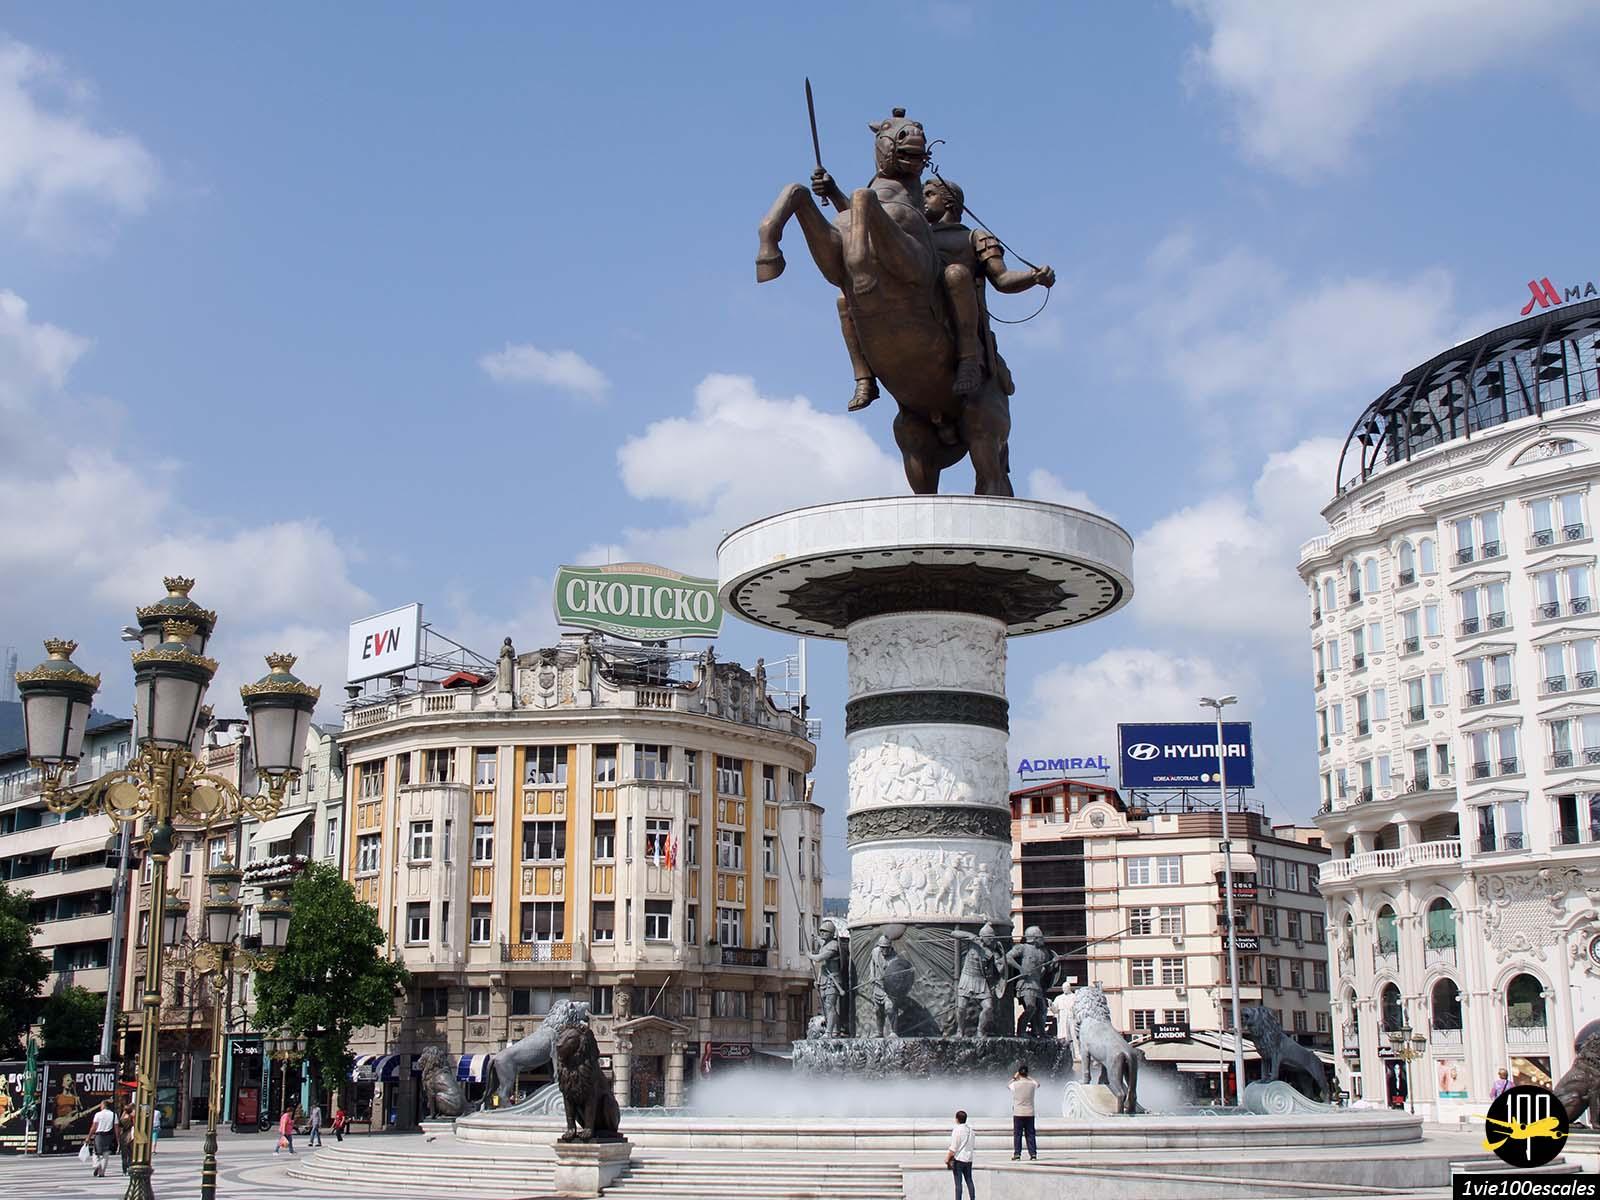 Escale #125 Skopje